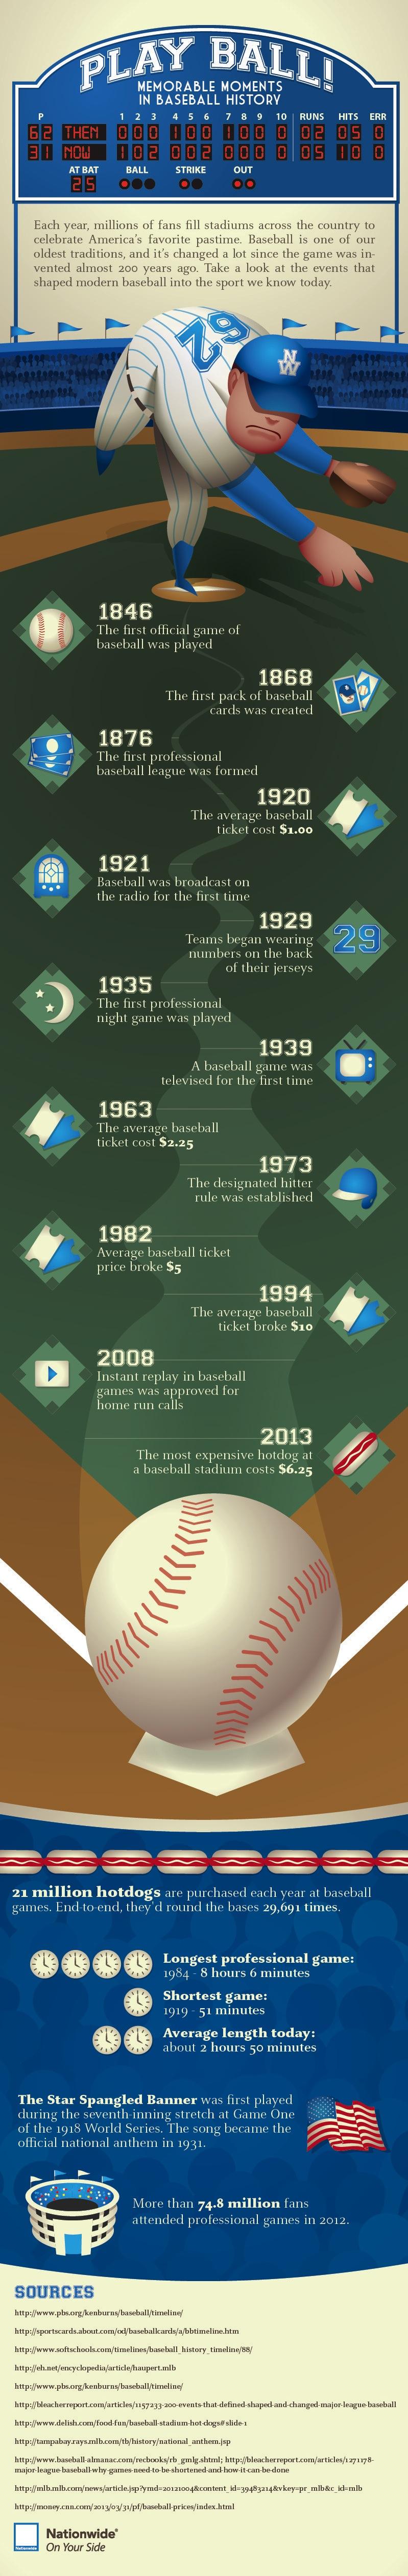 1baseball-infographic